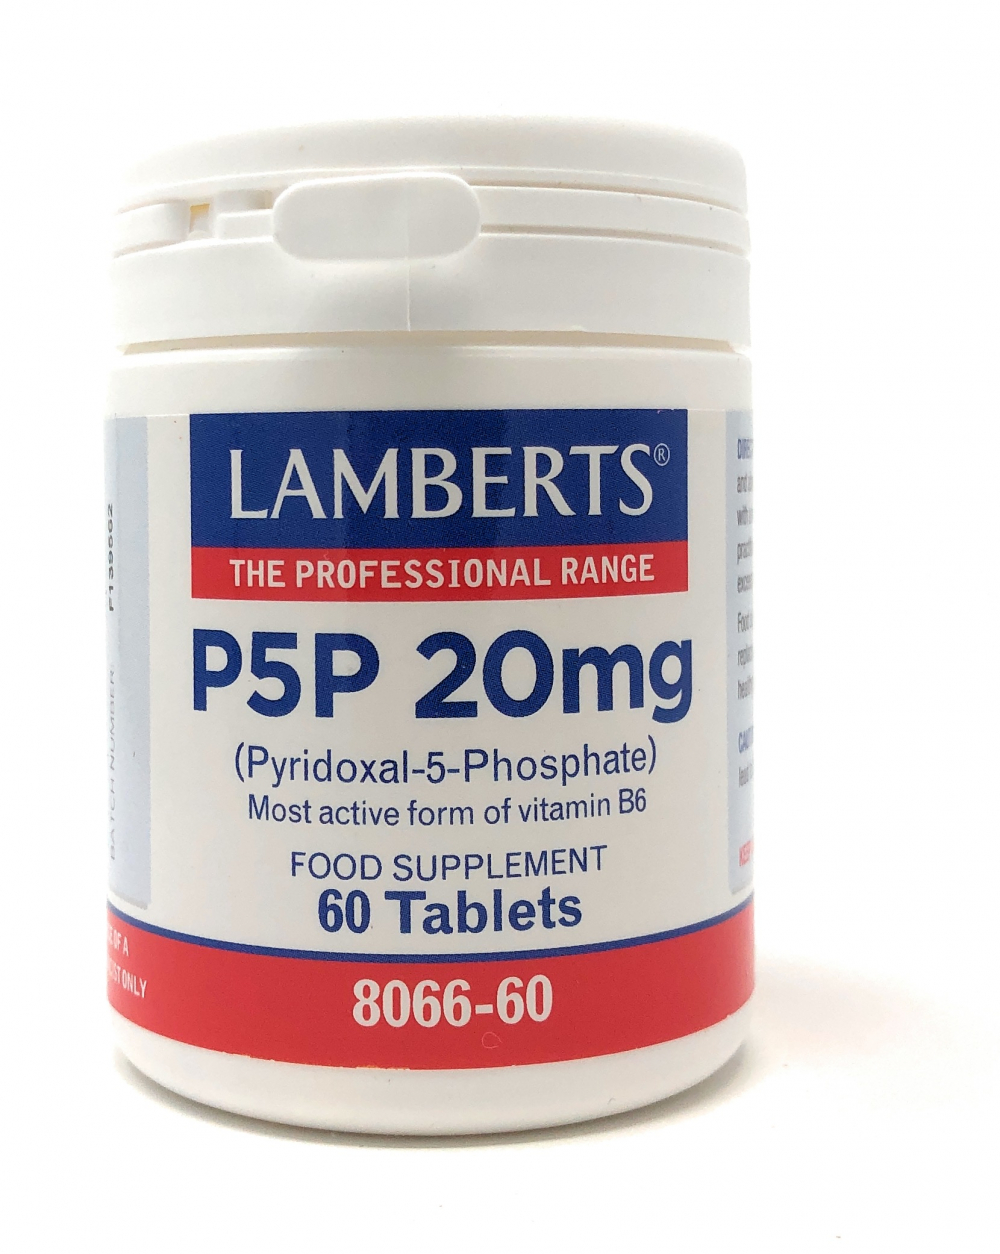 Lamberts Healthcare Ltd. P5P 20mg (Pyridoxal-5-Phosphate) 60 Tabletten (vegan)